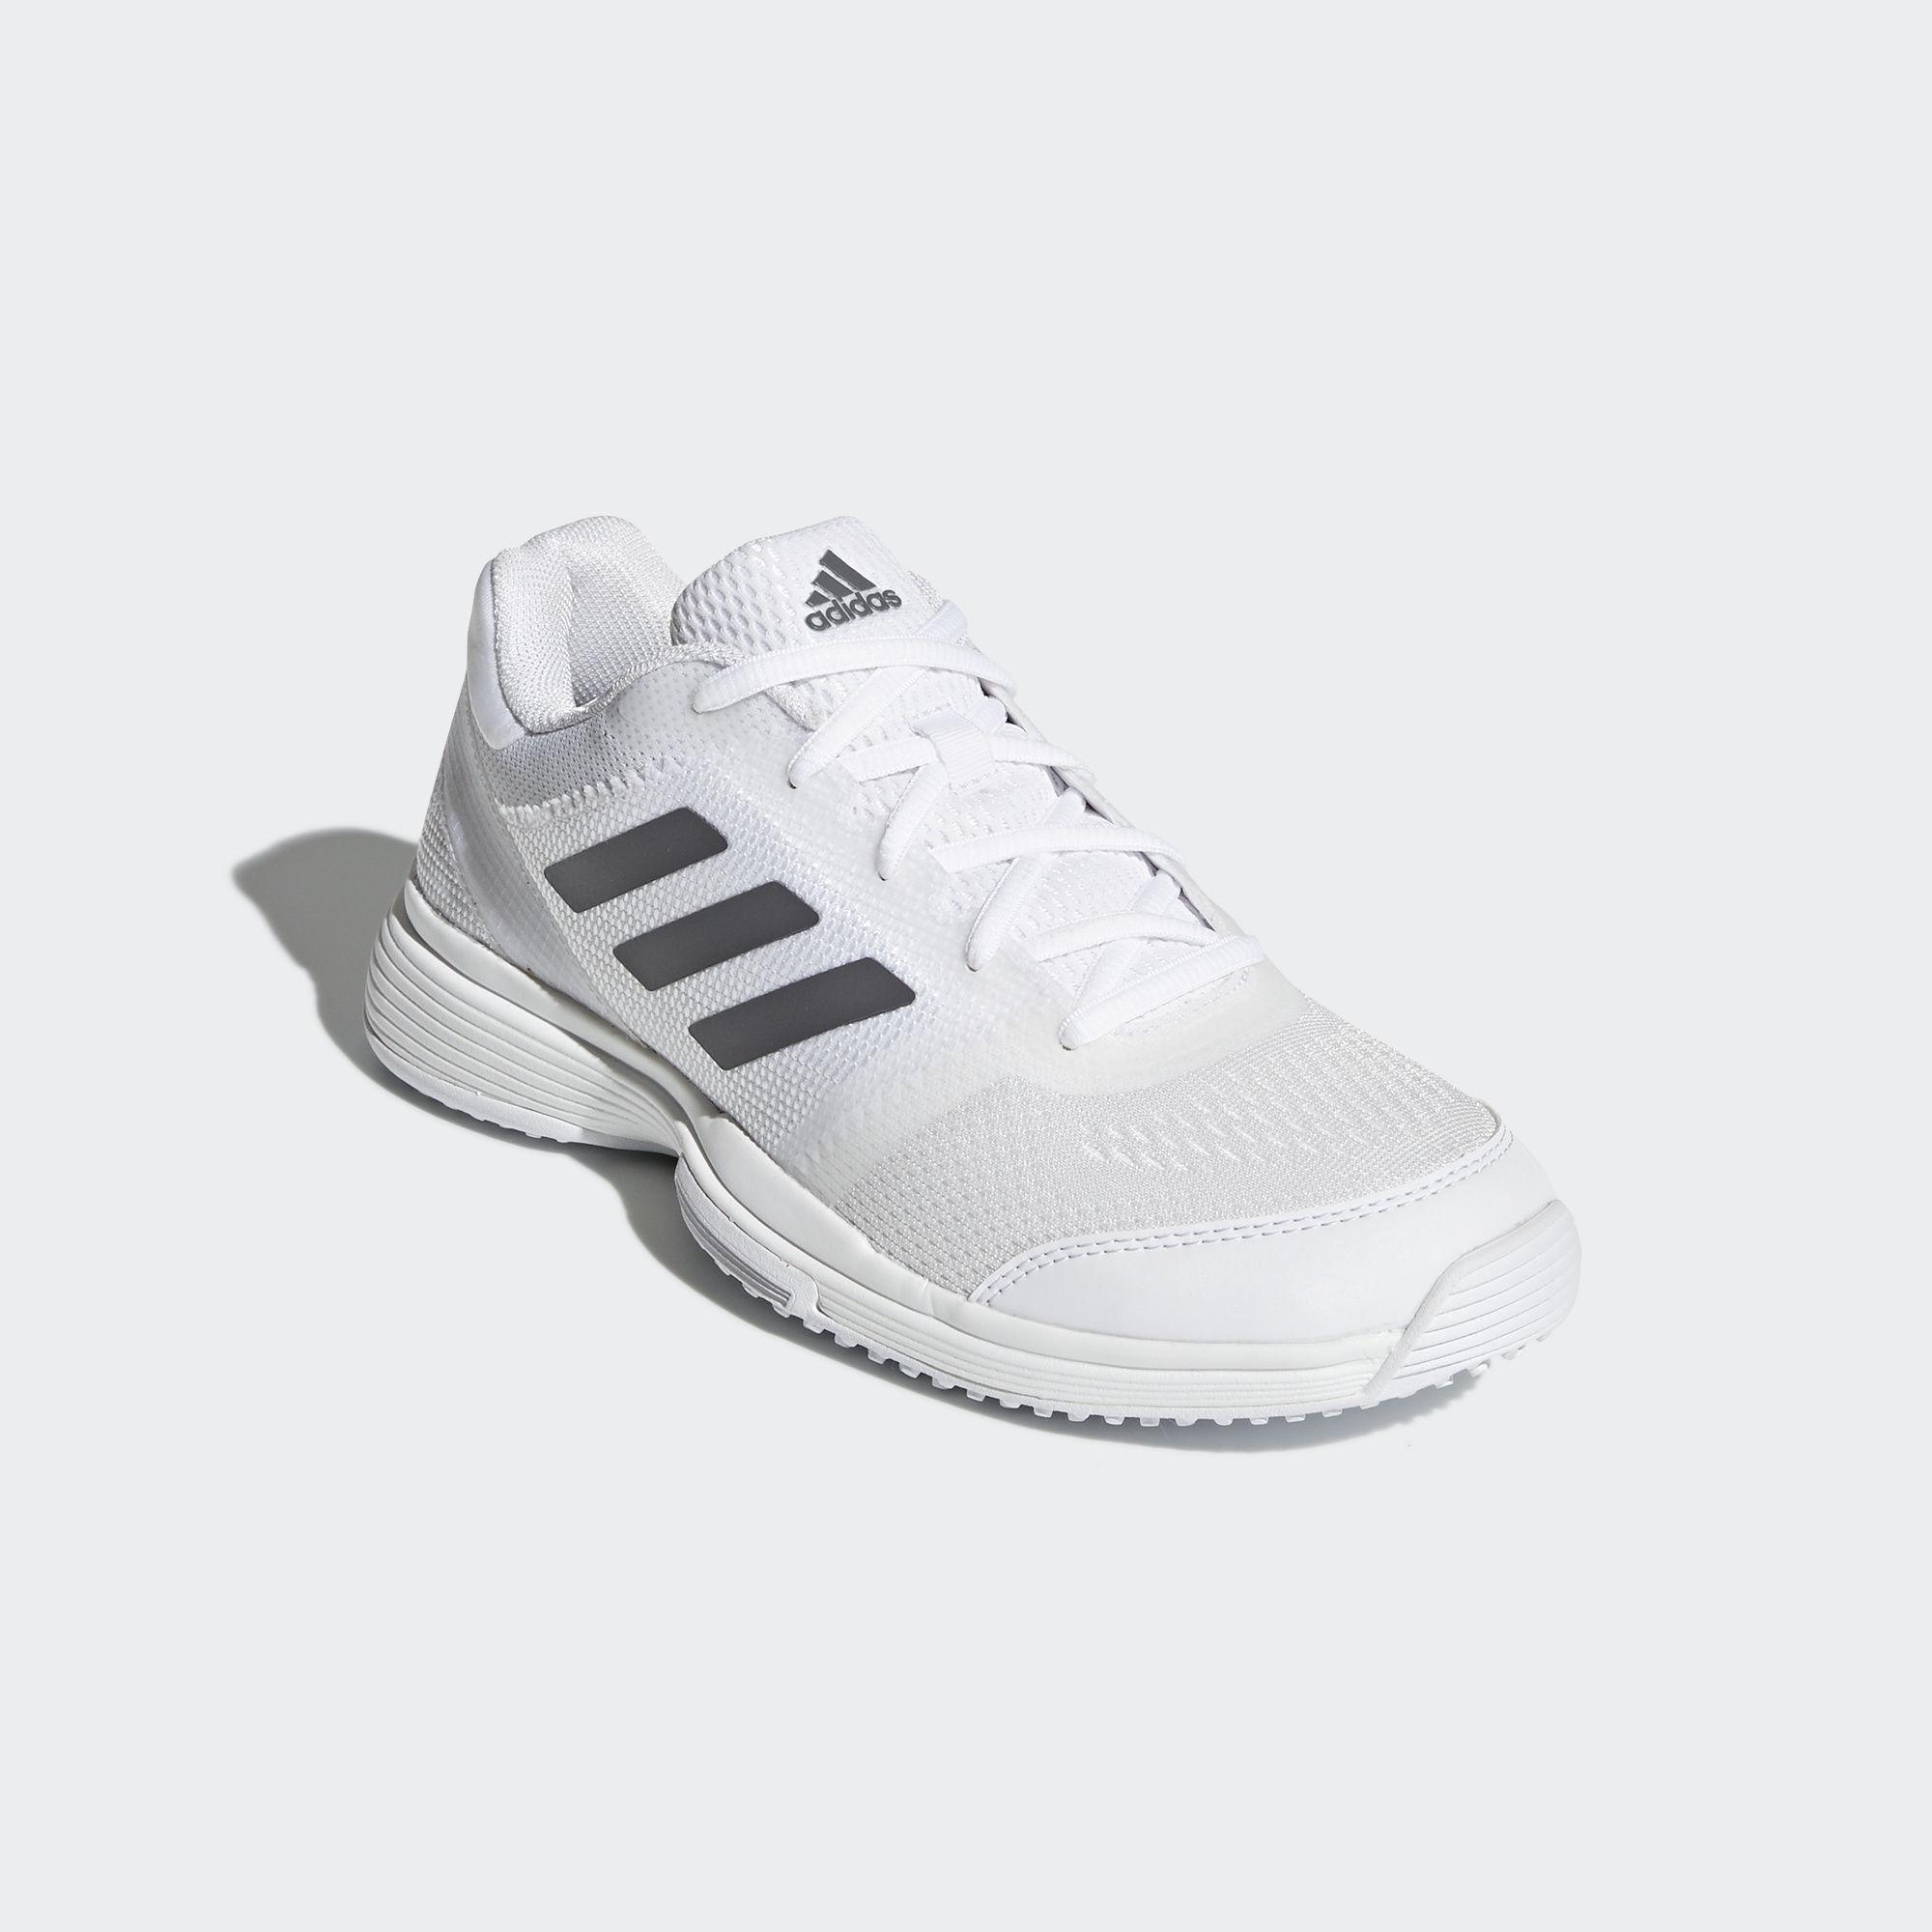 wholesale dealer c53cb 8b223 Adidas Womens Barricade 2018 Grass Court Tennis Shoes - White